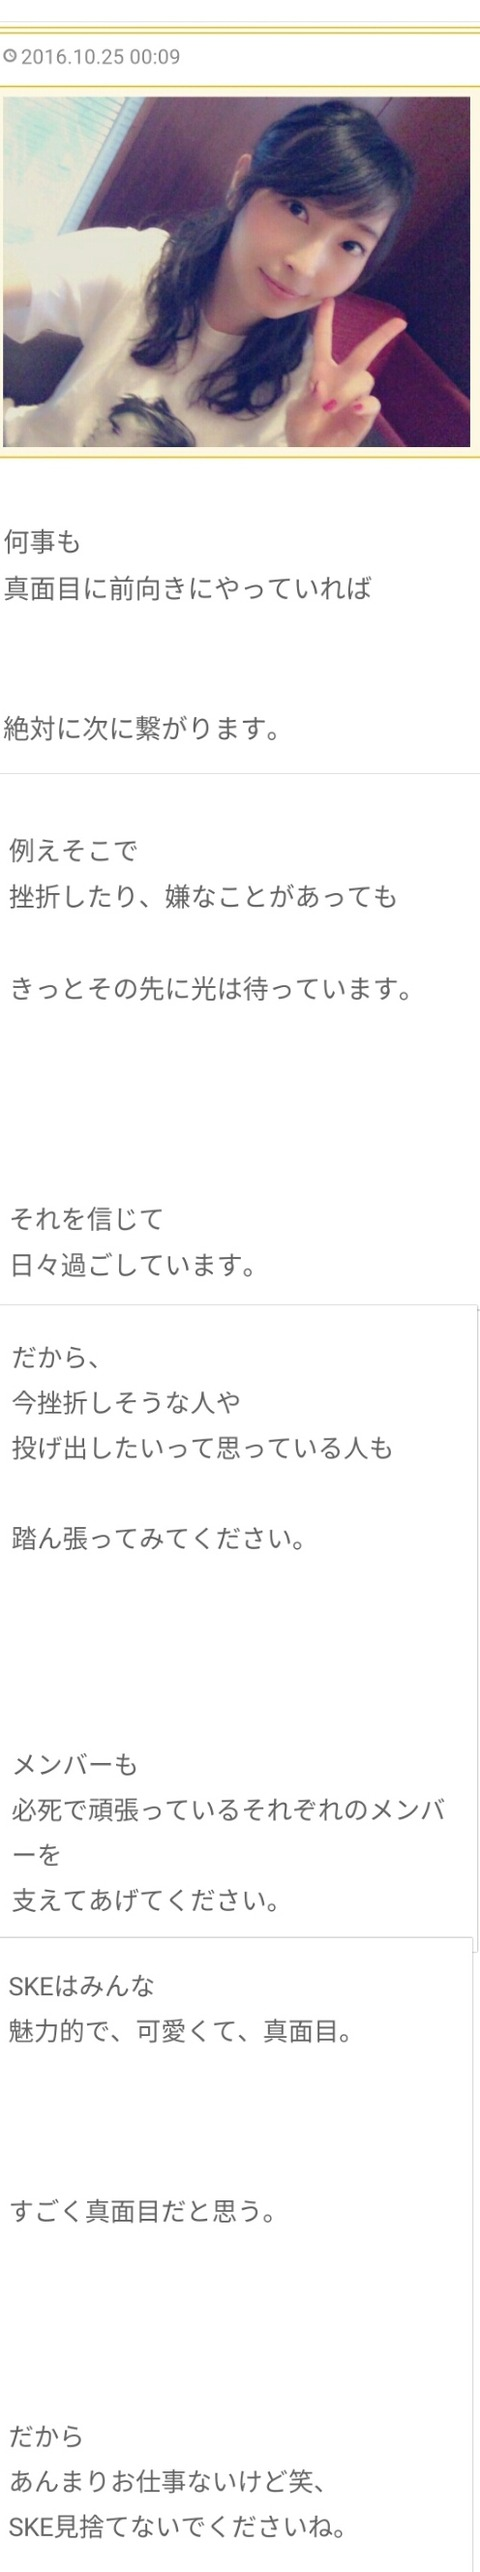 【SKE48】大矢真那「あんまりお仕事ないけど笑、SKE見捨てないでくださいね」